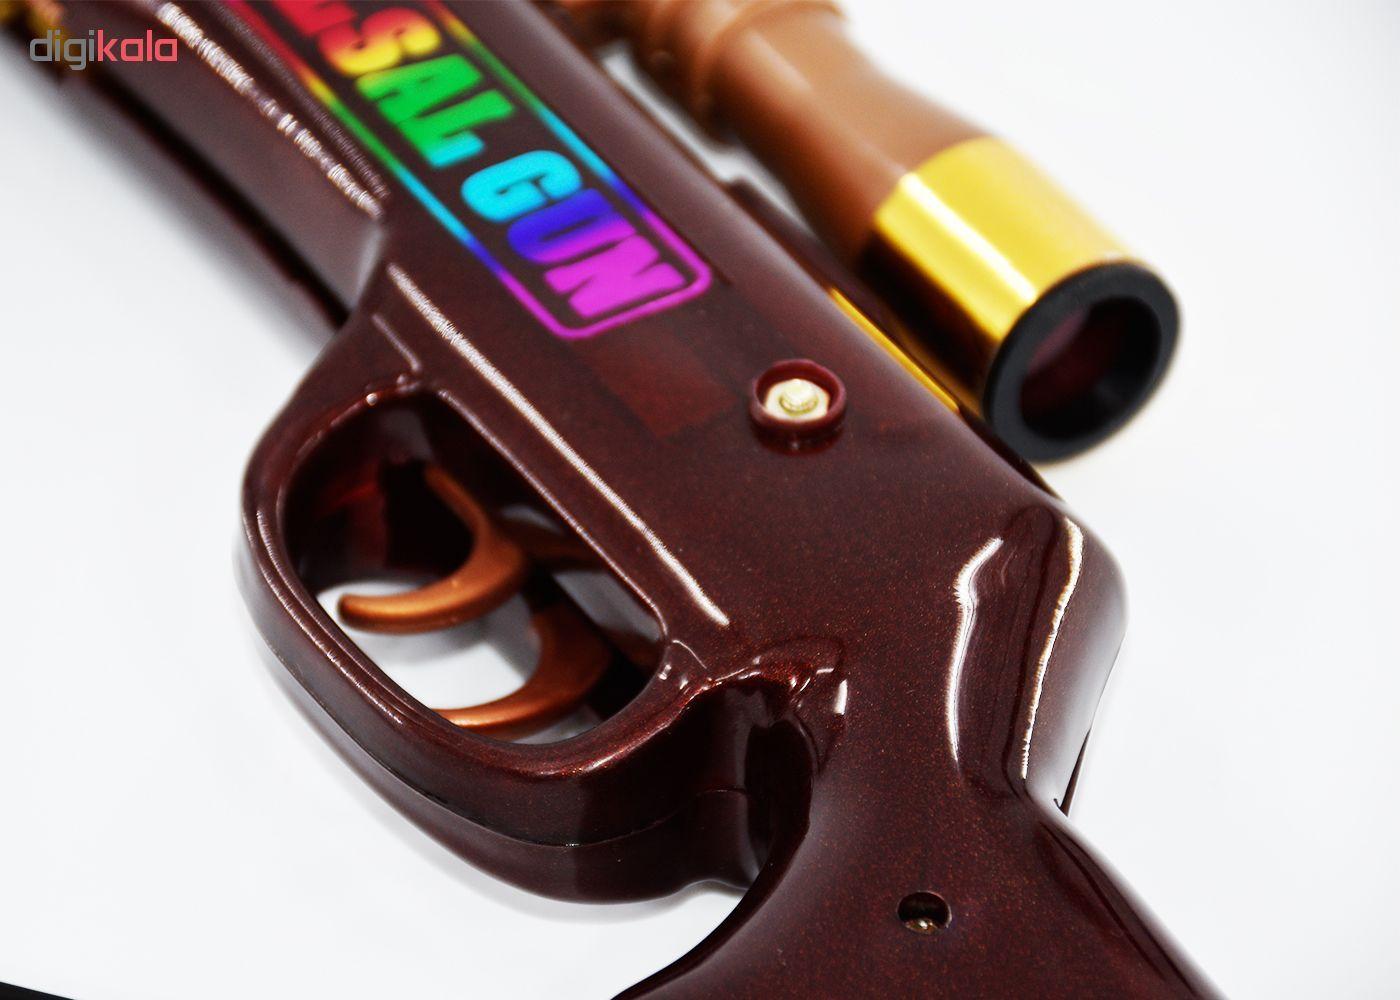 تفنگ اسباب بازی مدل salsal main 1 1